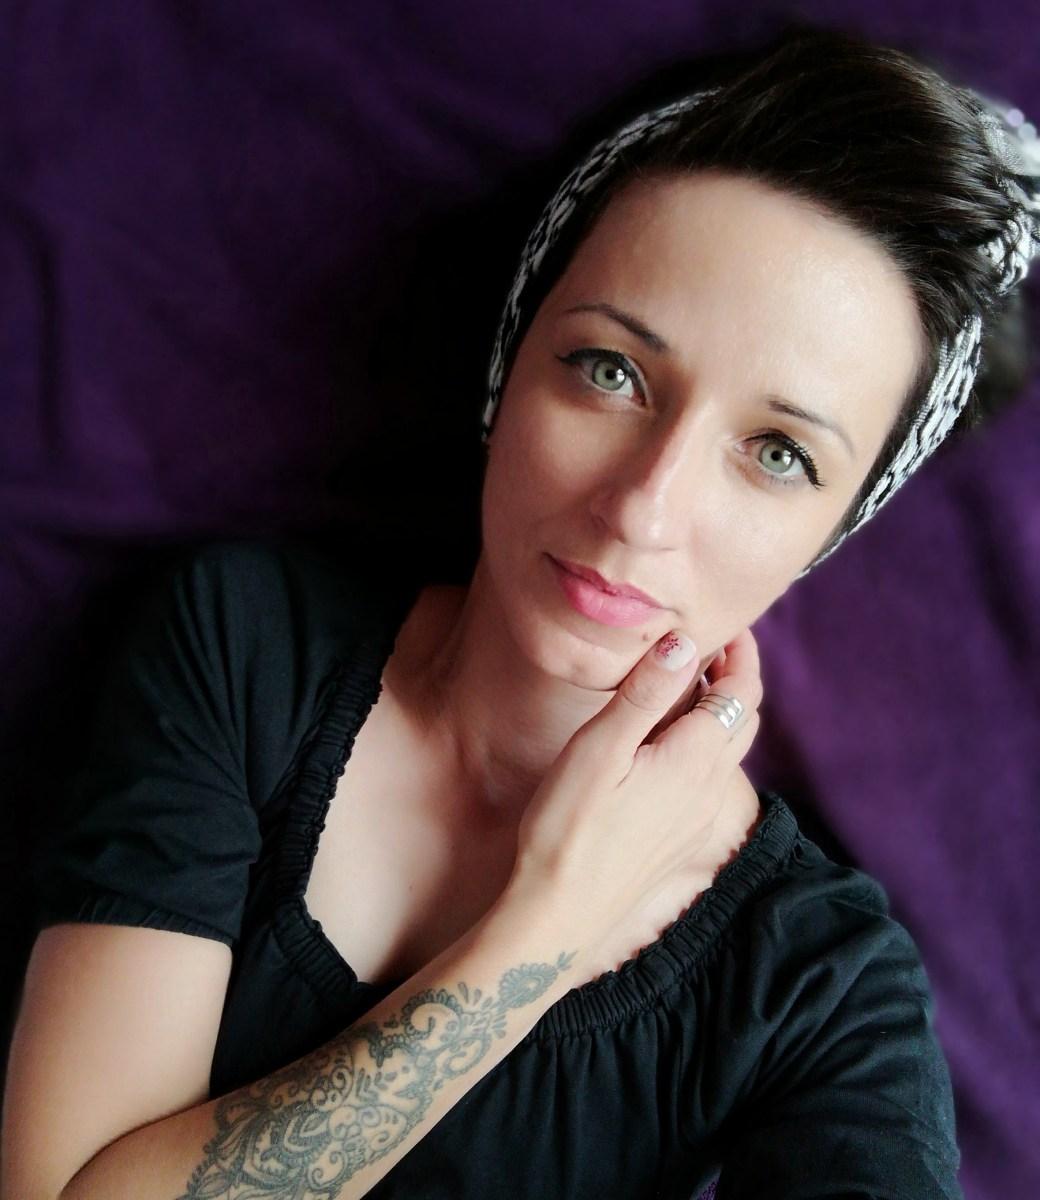 Melita Makovec i druga pjesma